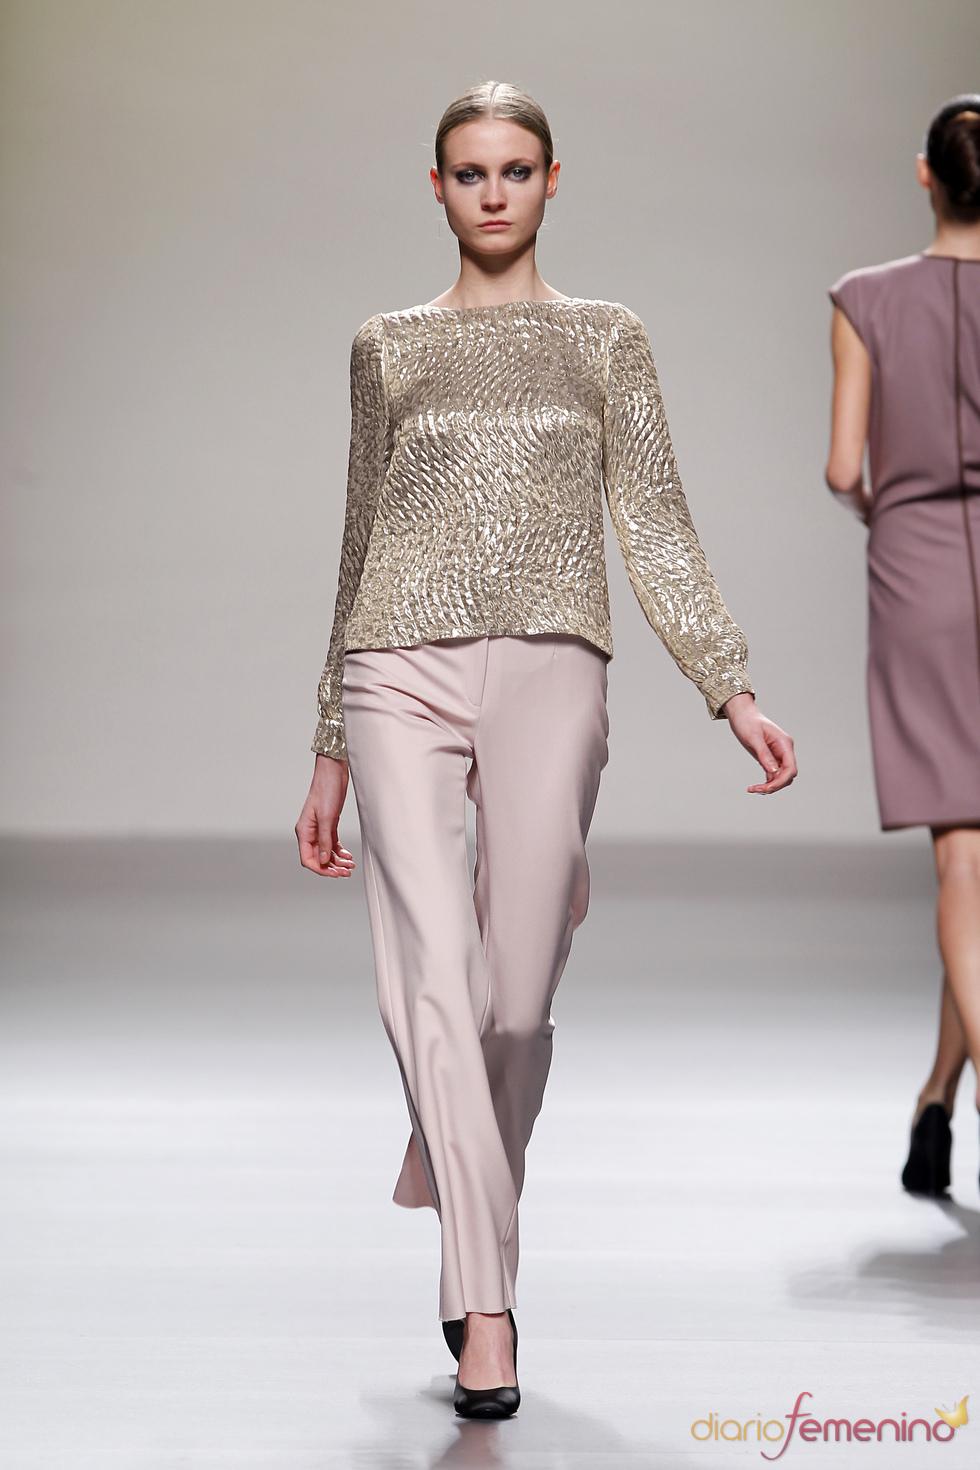 Moda Mujer: Lemoniez en la pasarela Cibeles 2010